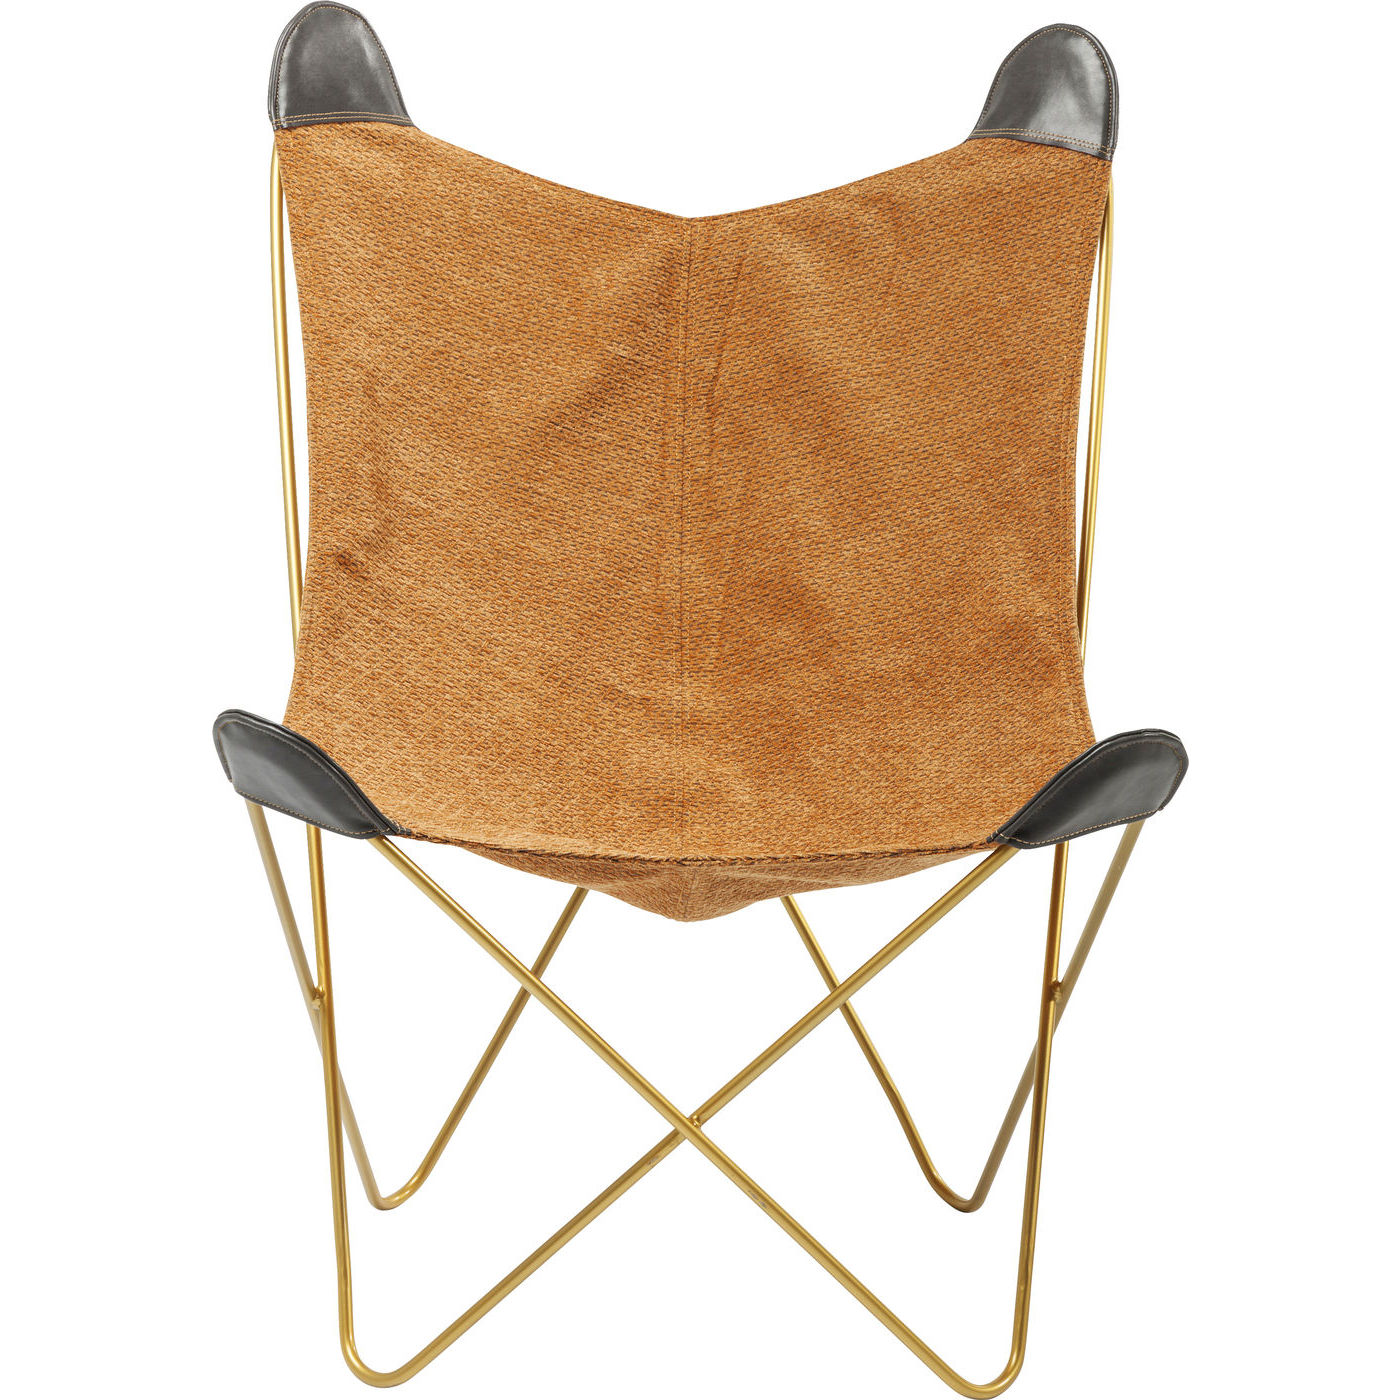 sessel butterfly malm gelb. Black Bedroom Furniture Sets. Home Design Ideas